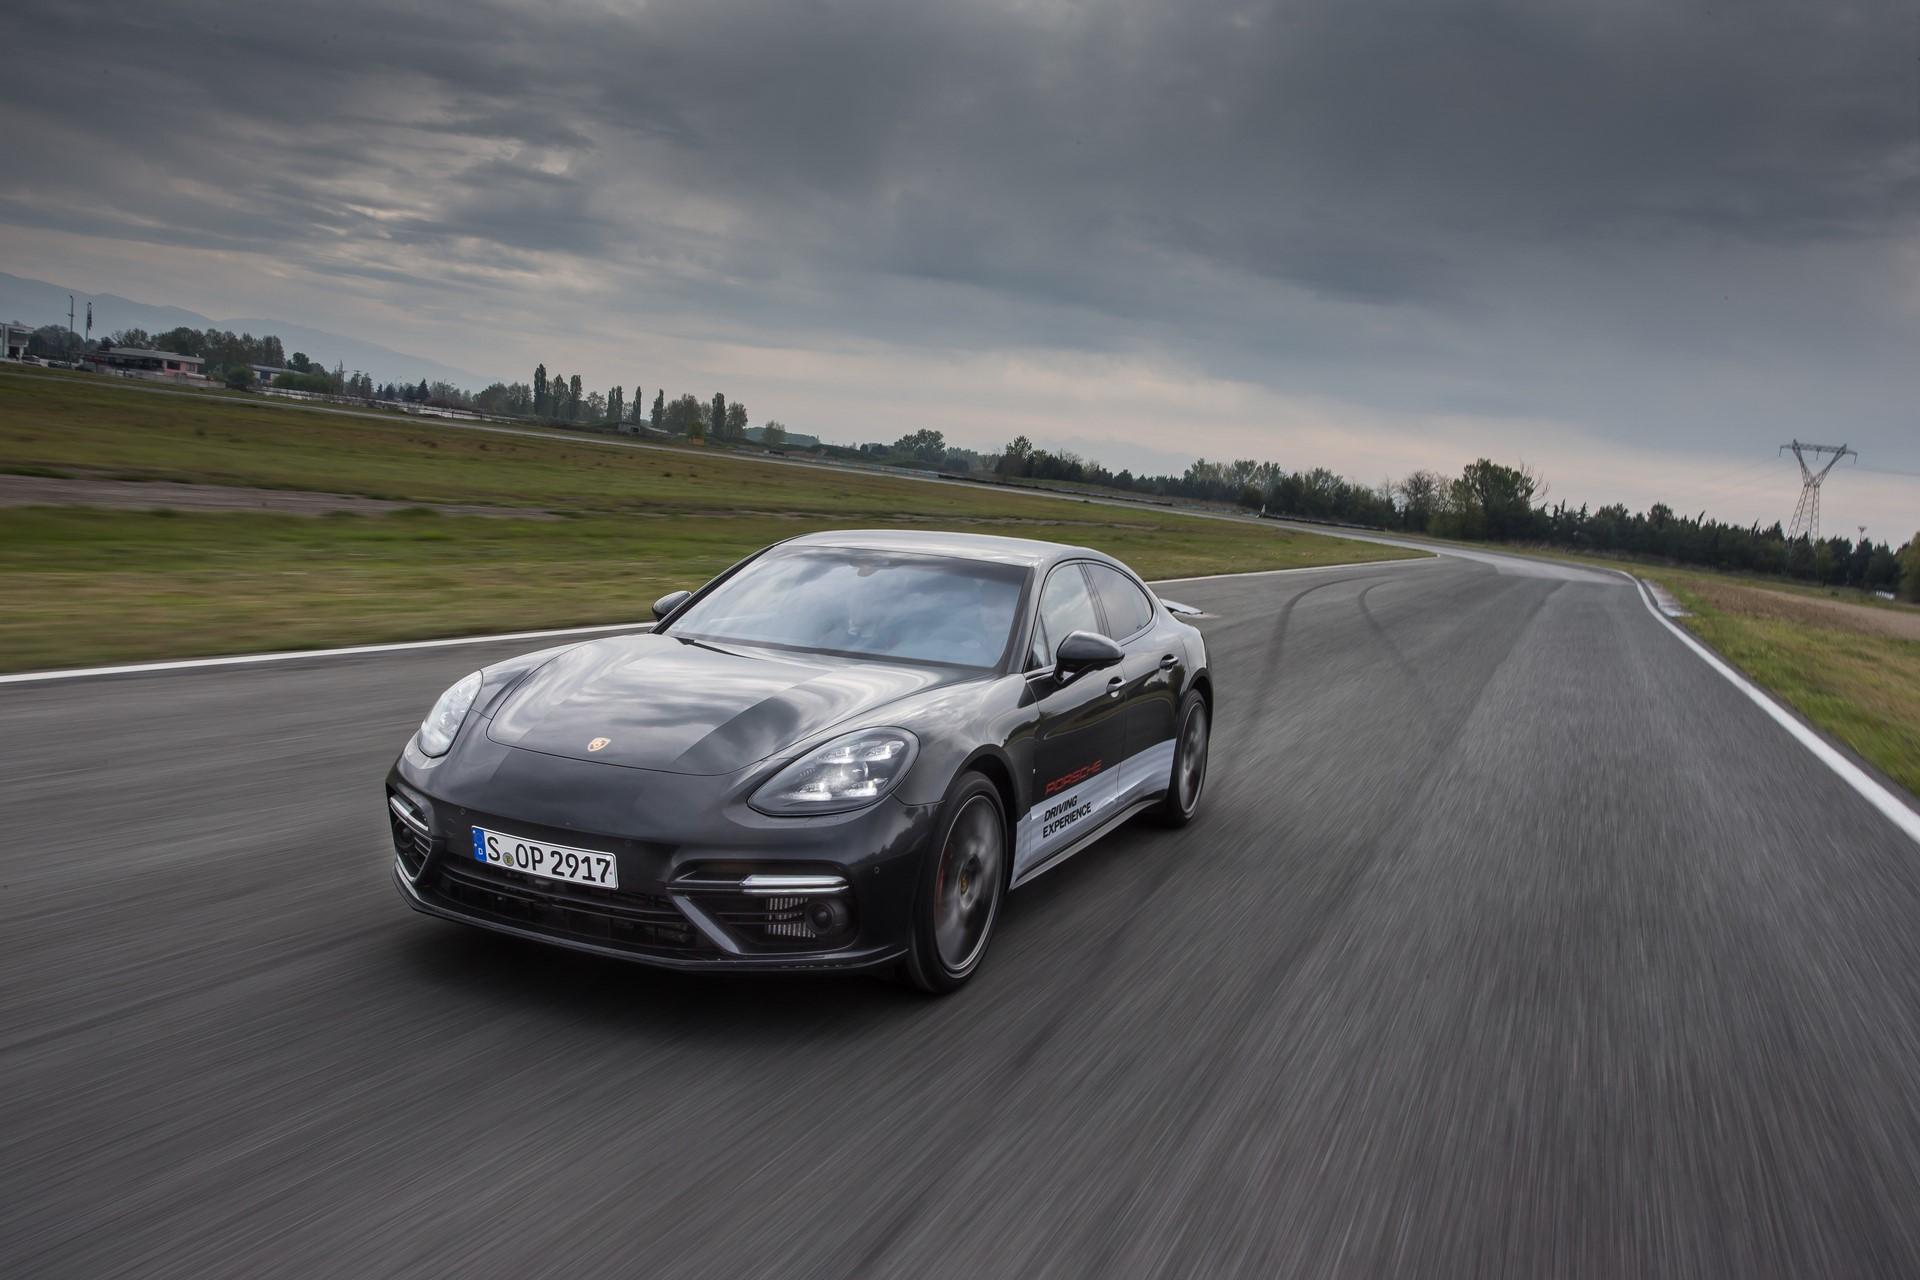 Porsche Driving Experience 2017 Serres (46)